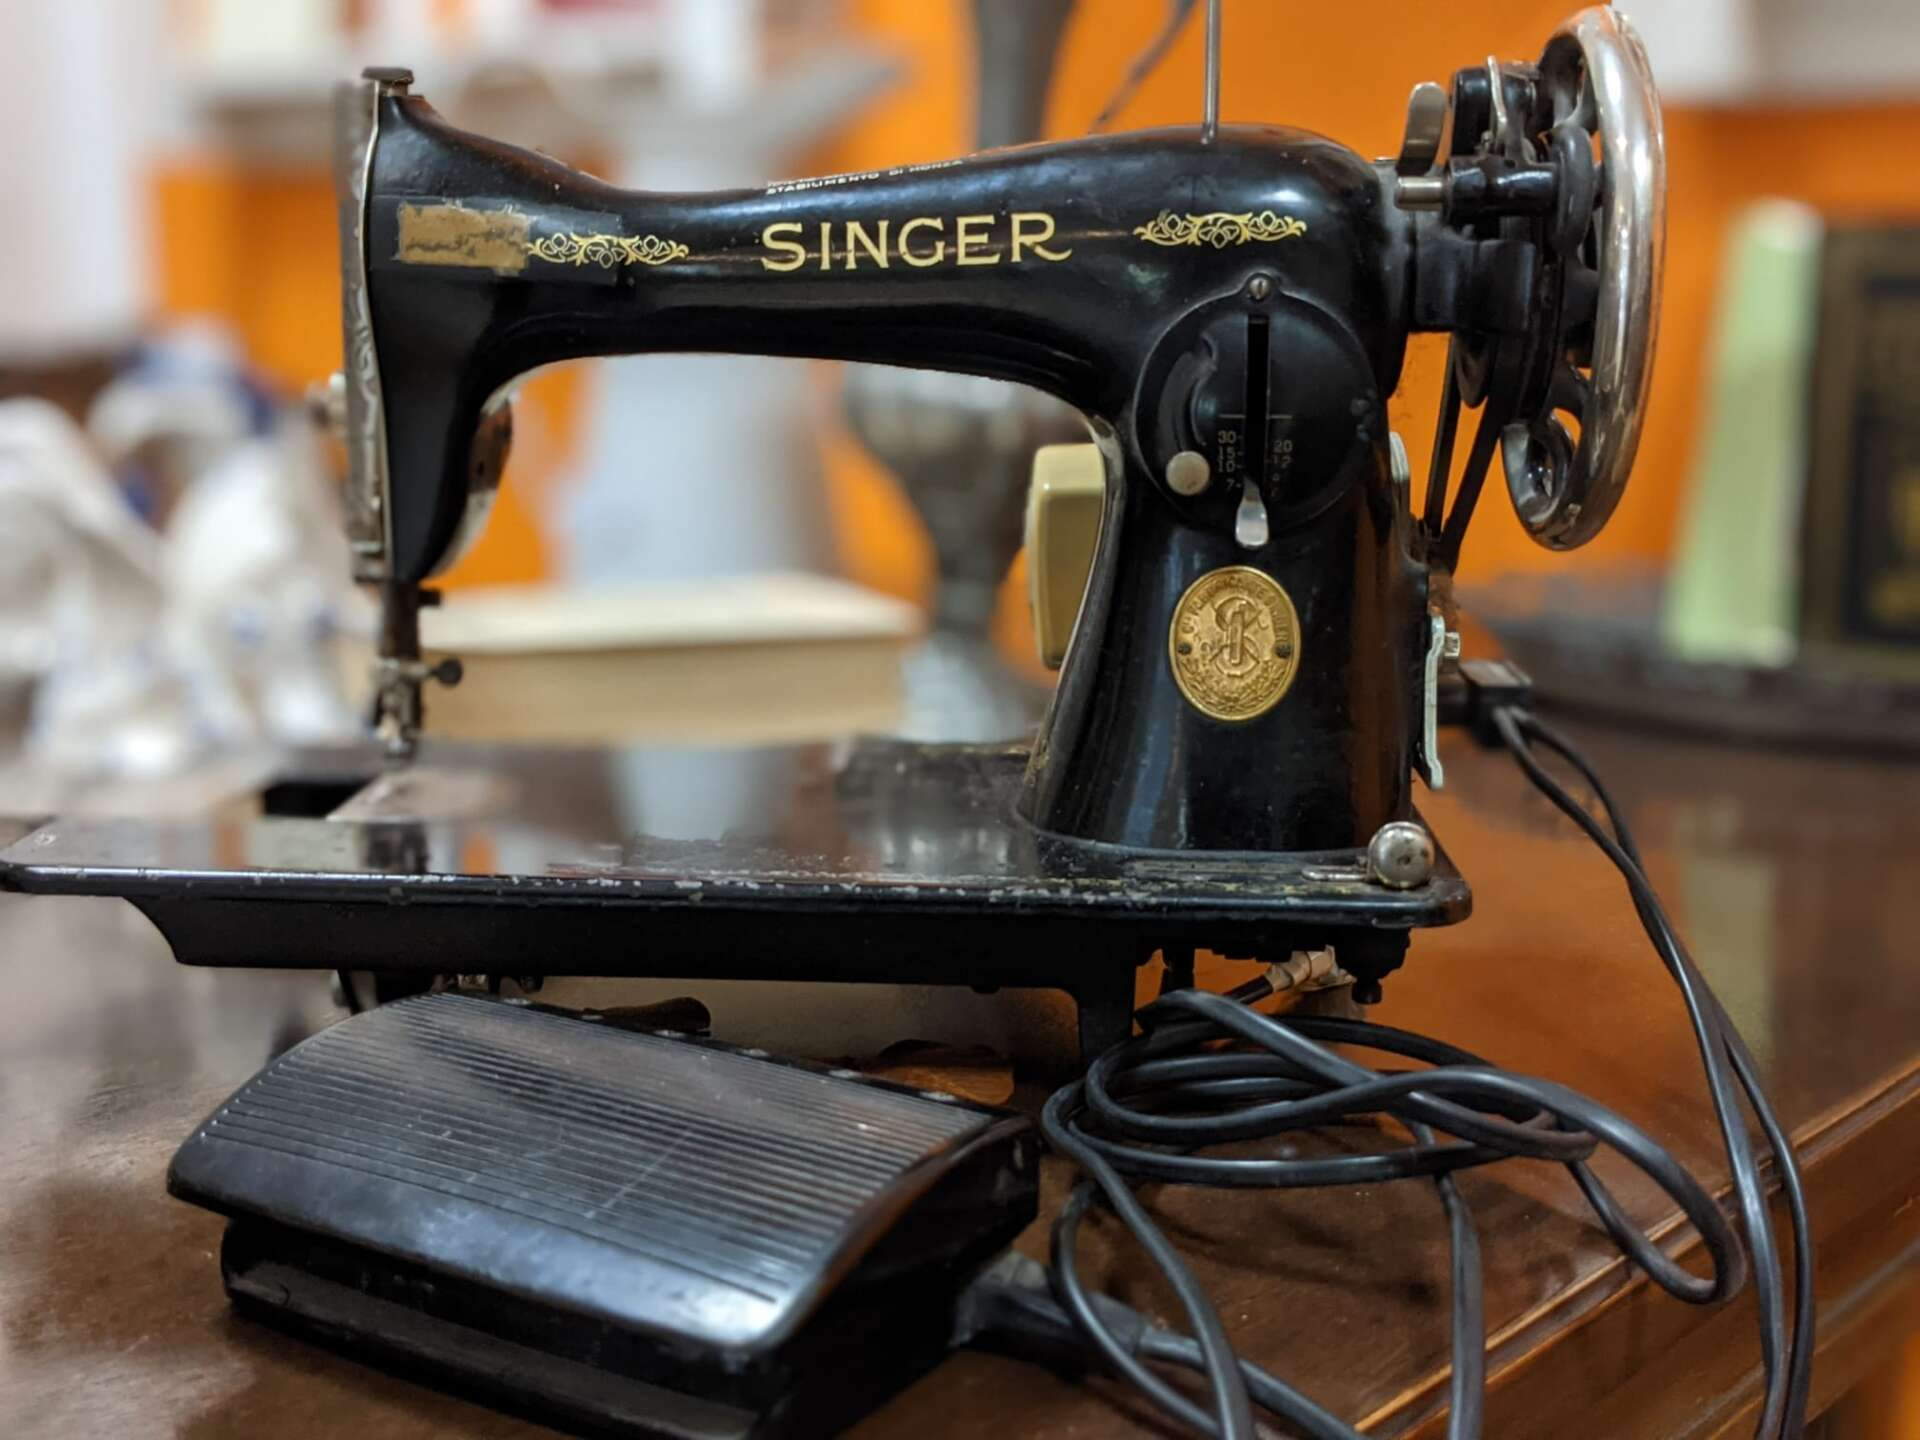 macchina da cucire Singer